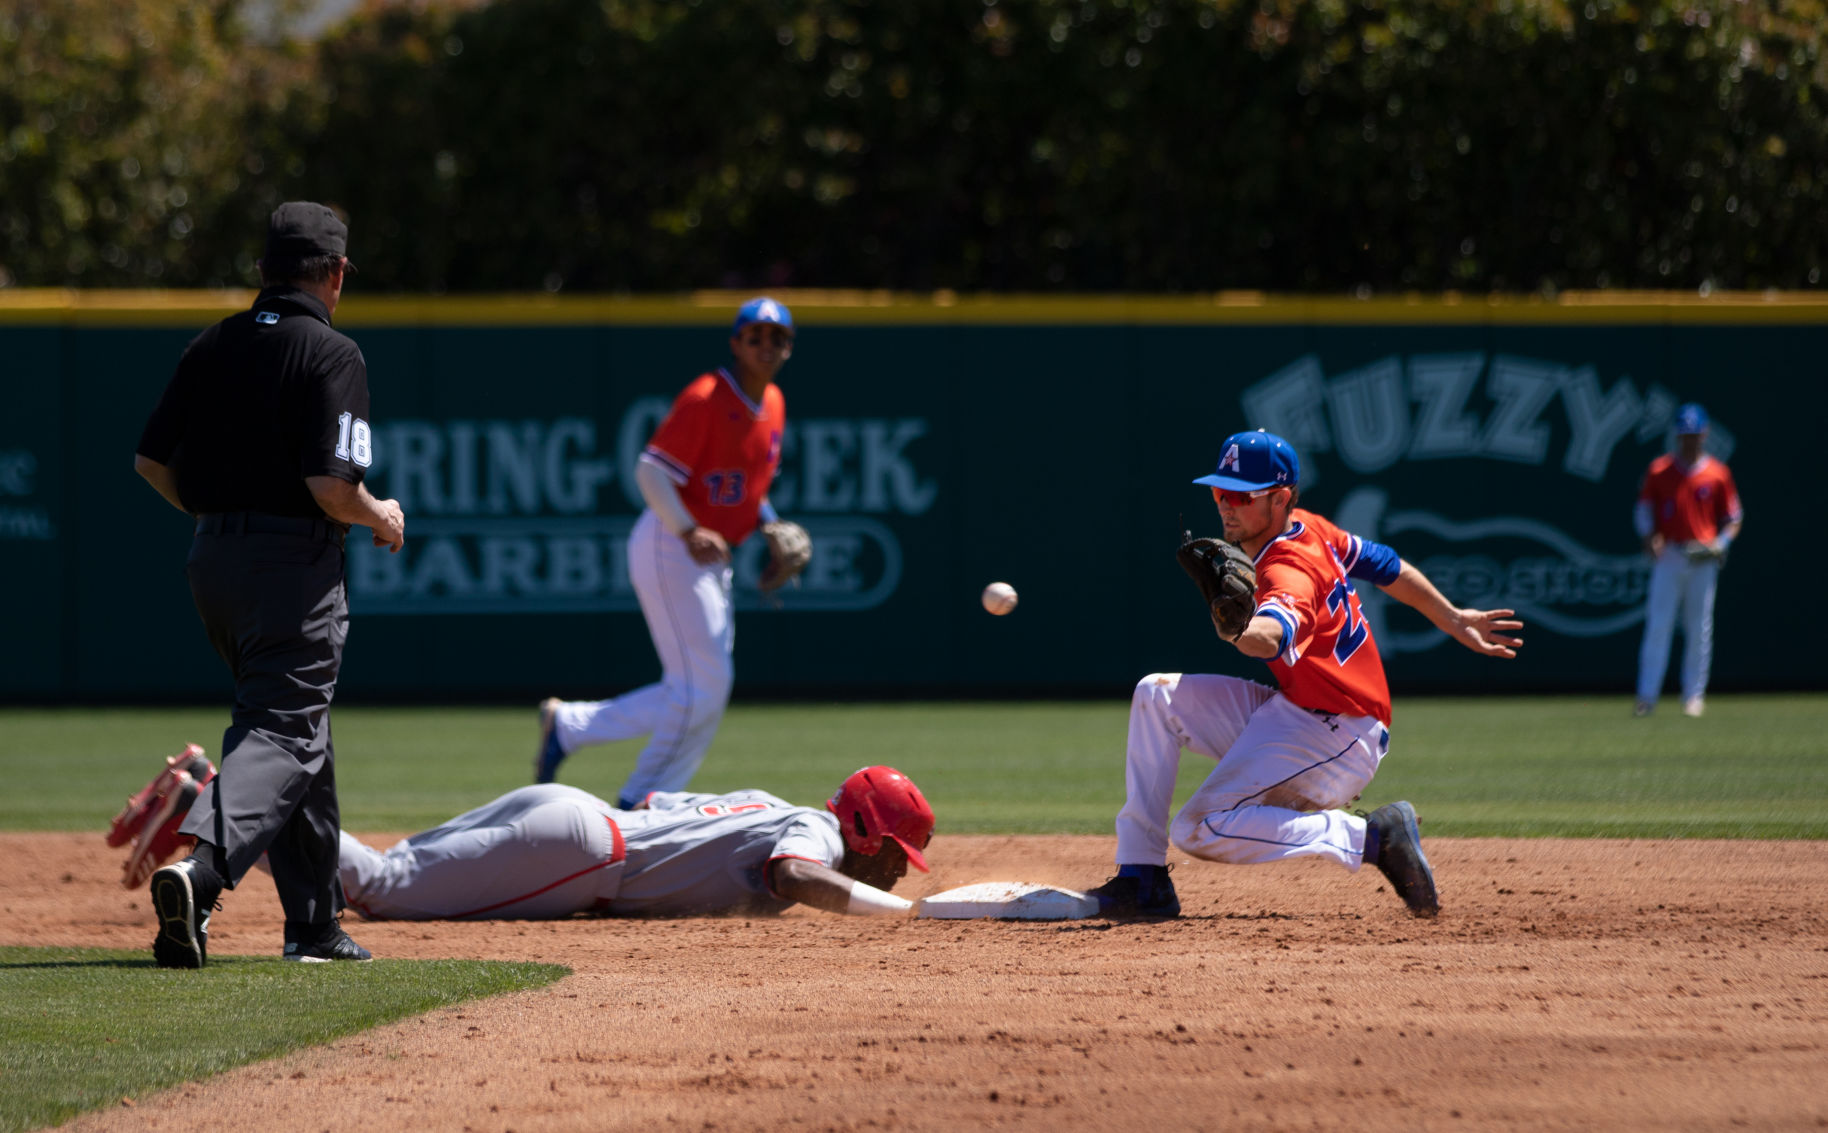 UTA baseball claims ninth straight victory with win over University of Louisiana at Lafayette